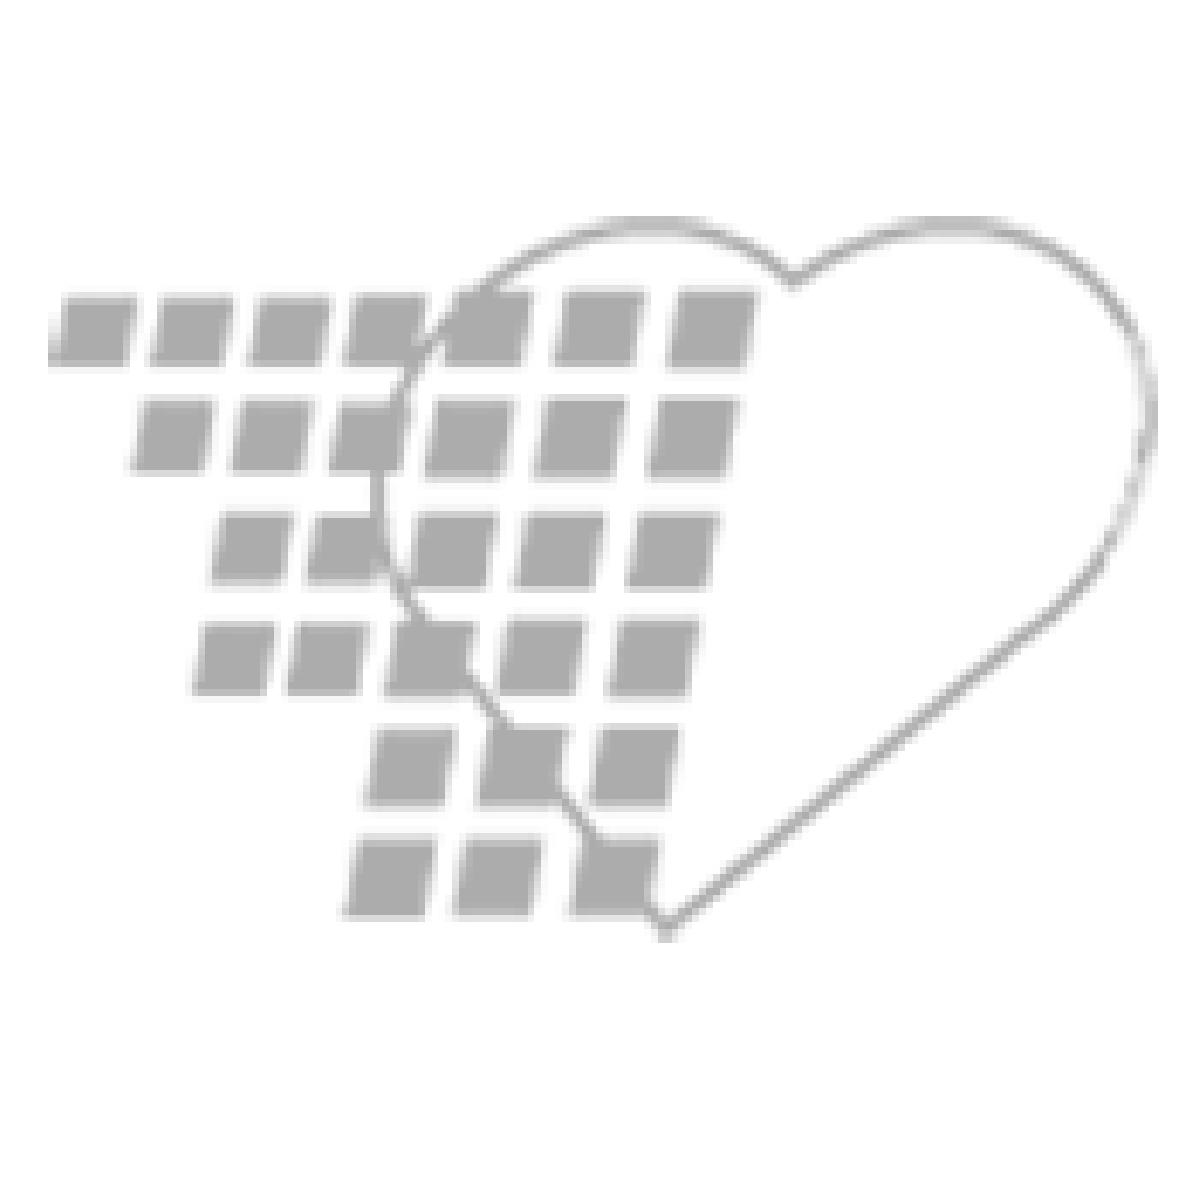 03-47-1240-LG - Innovative Healthcare Corporation DermAssist® COATS   - Large